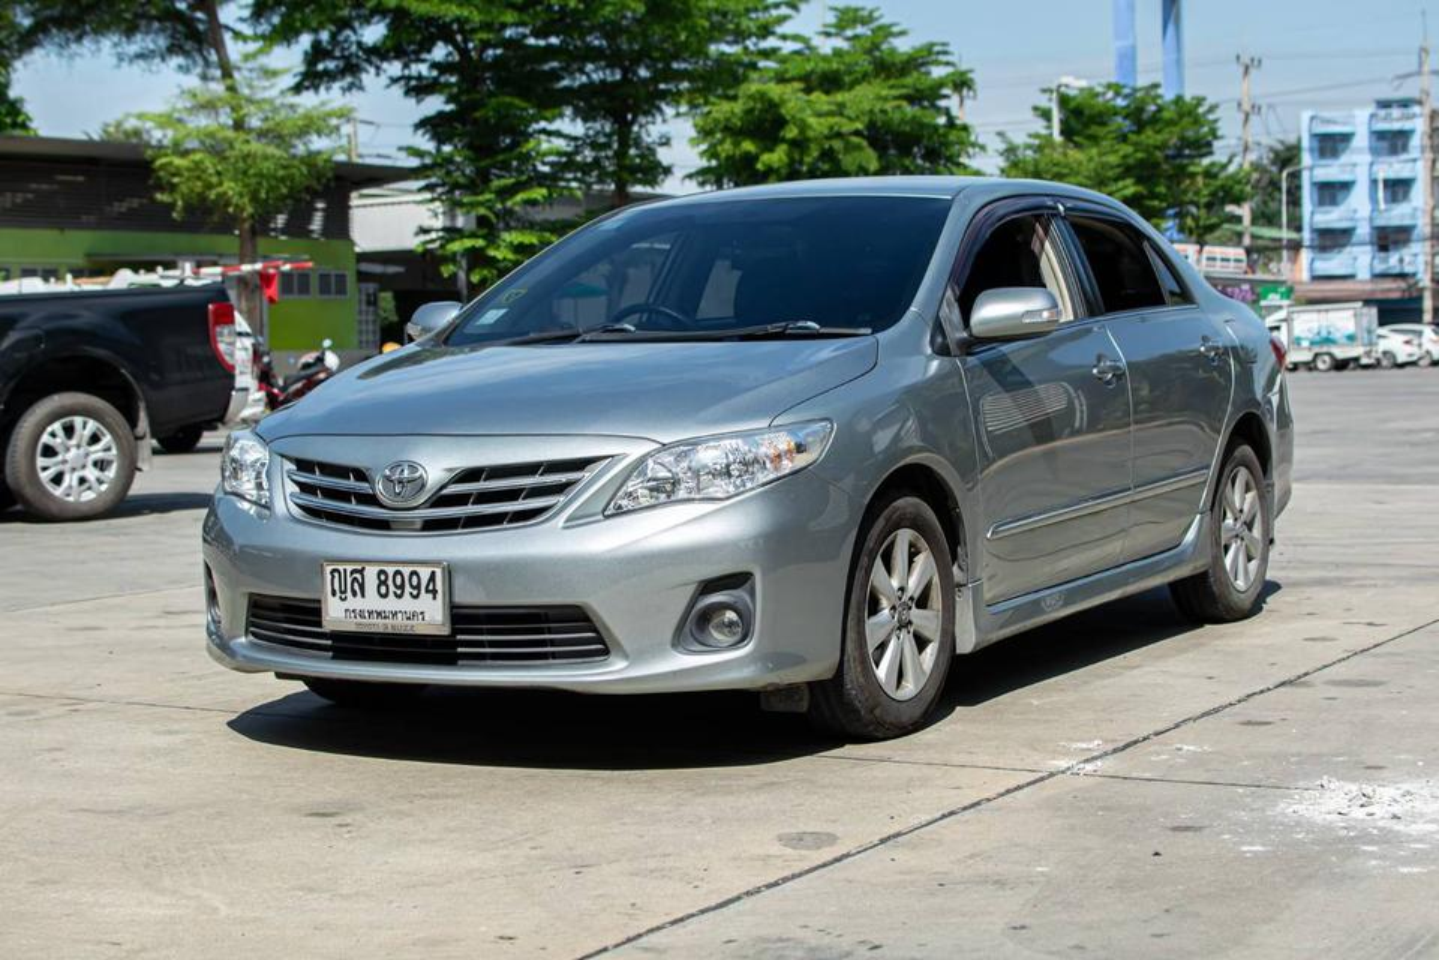 2011 Toyota Corolla Altis 1.6 (ปี 08-13) CNG Sedan รูปที่ 2